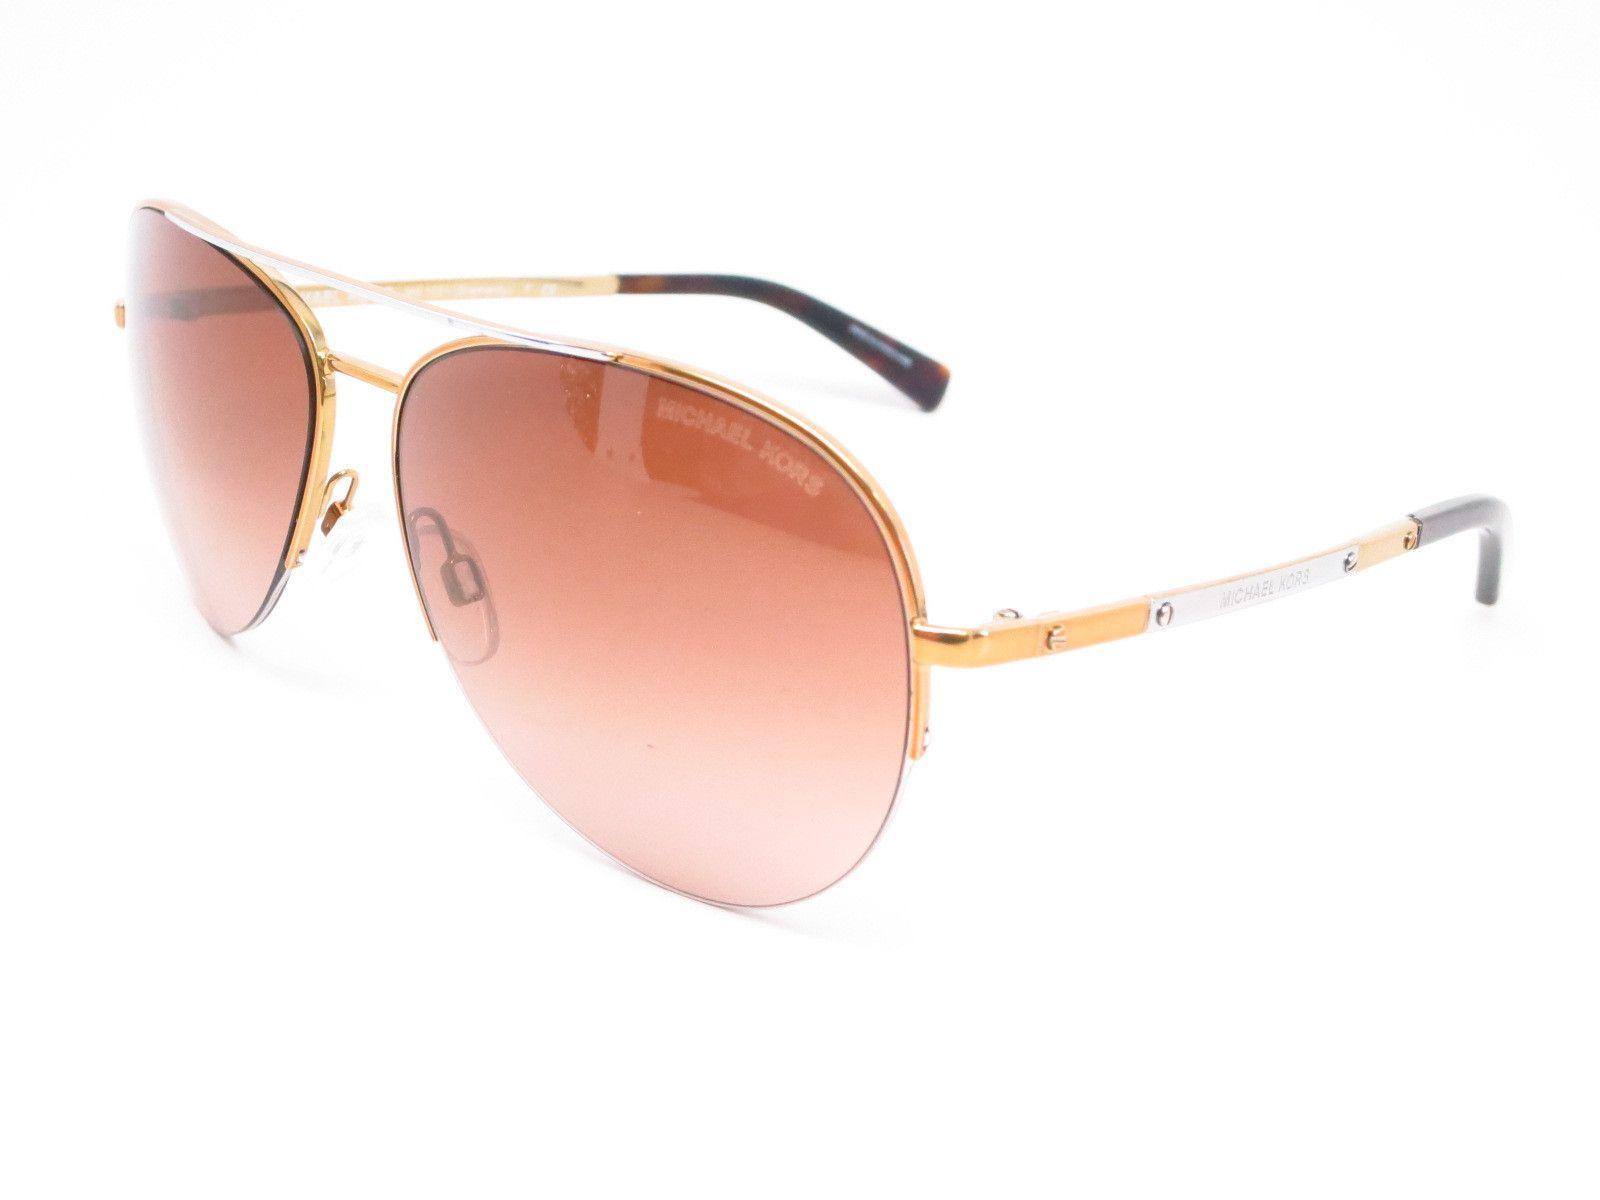 5ef62cb6984 Michael Kors Gramercy Product Details Brand Name   Michael Kors Model  Number   MK 1001 -